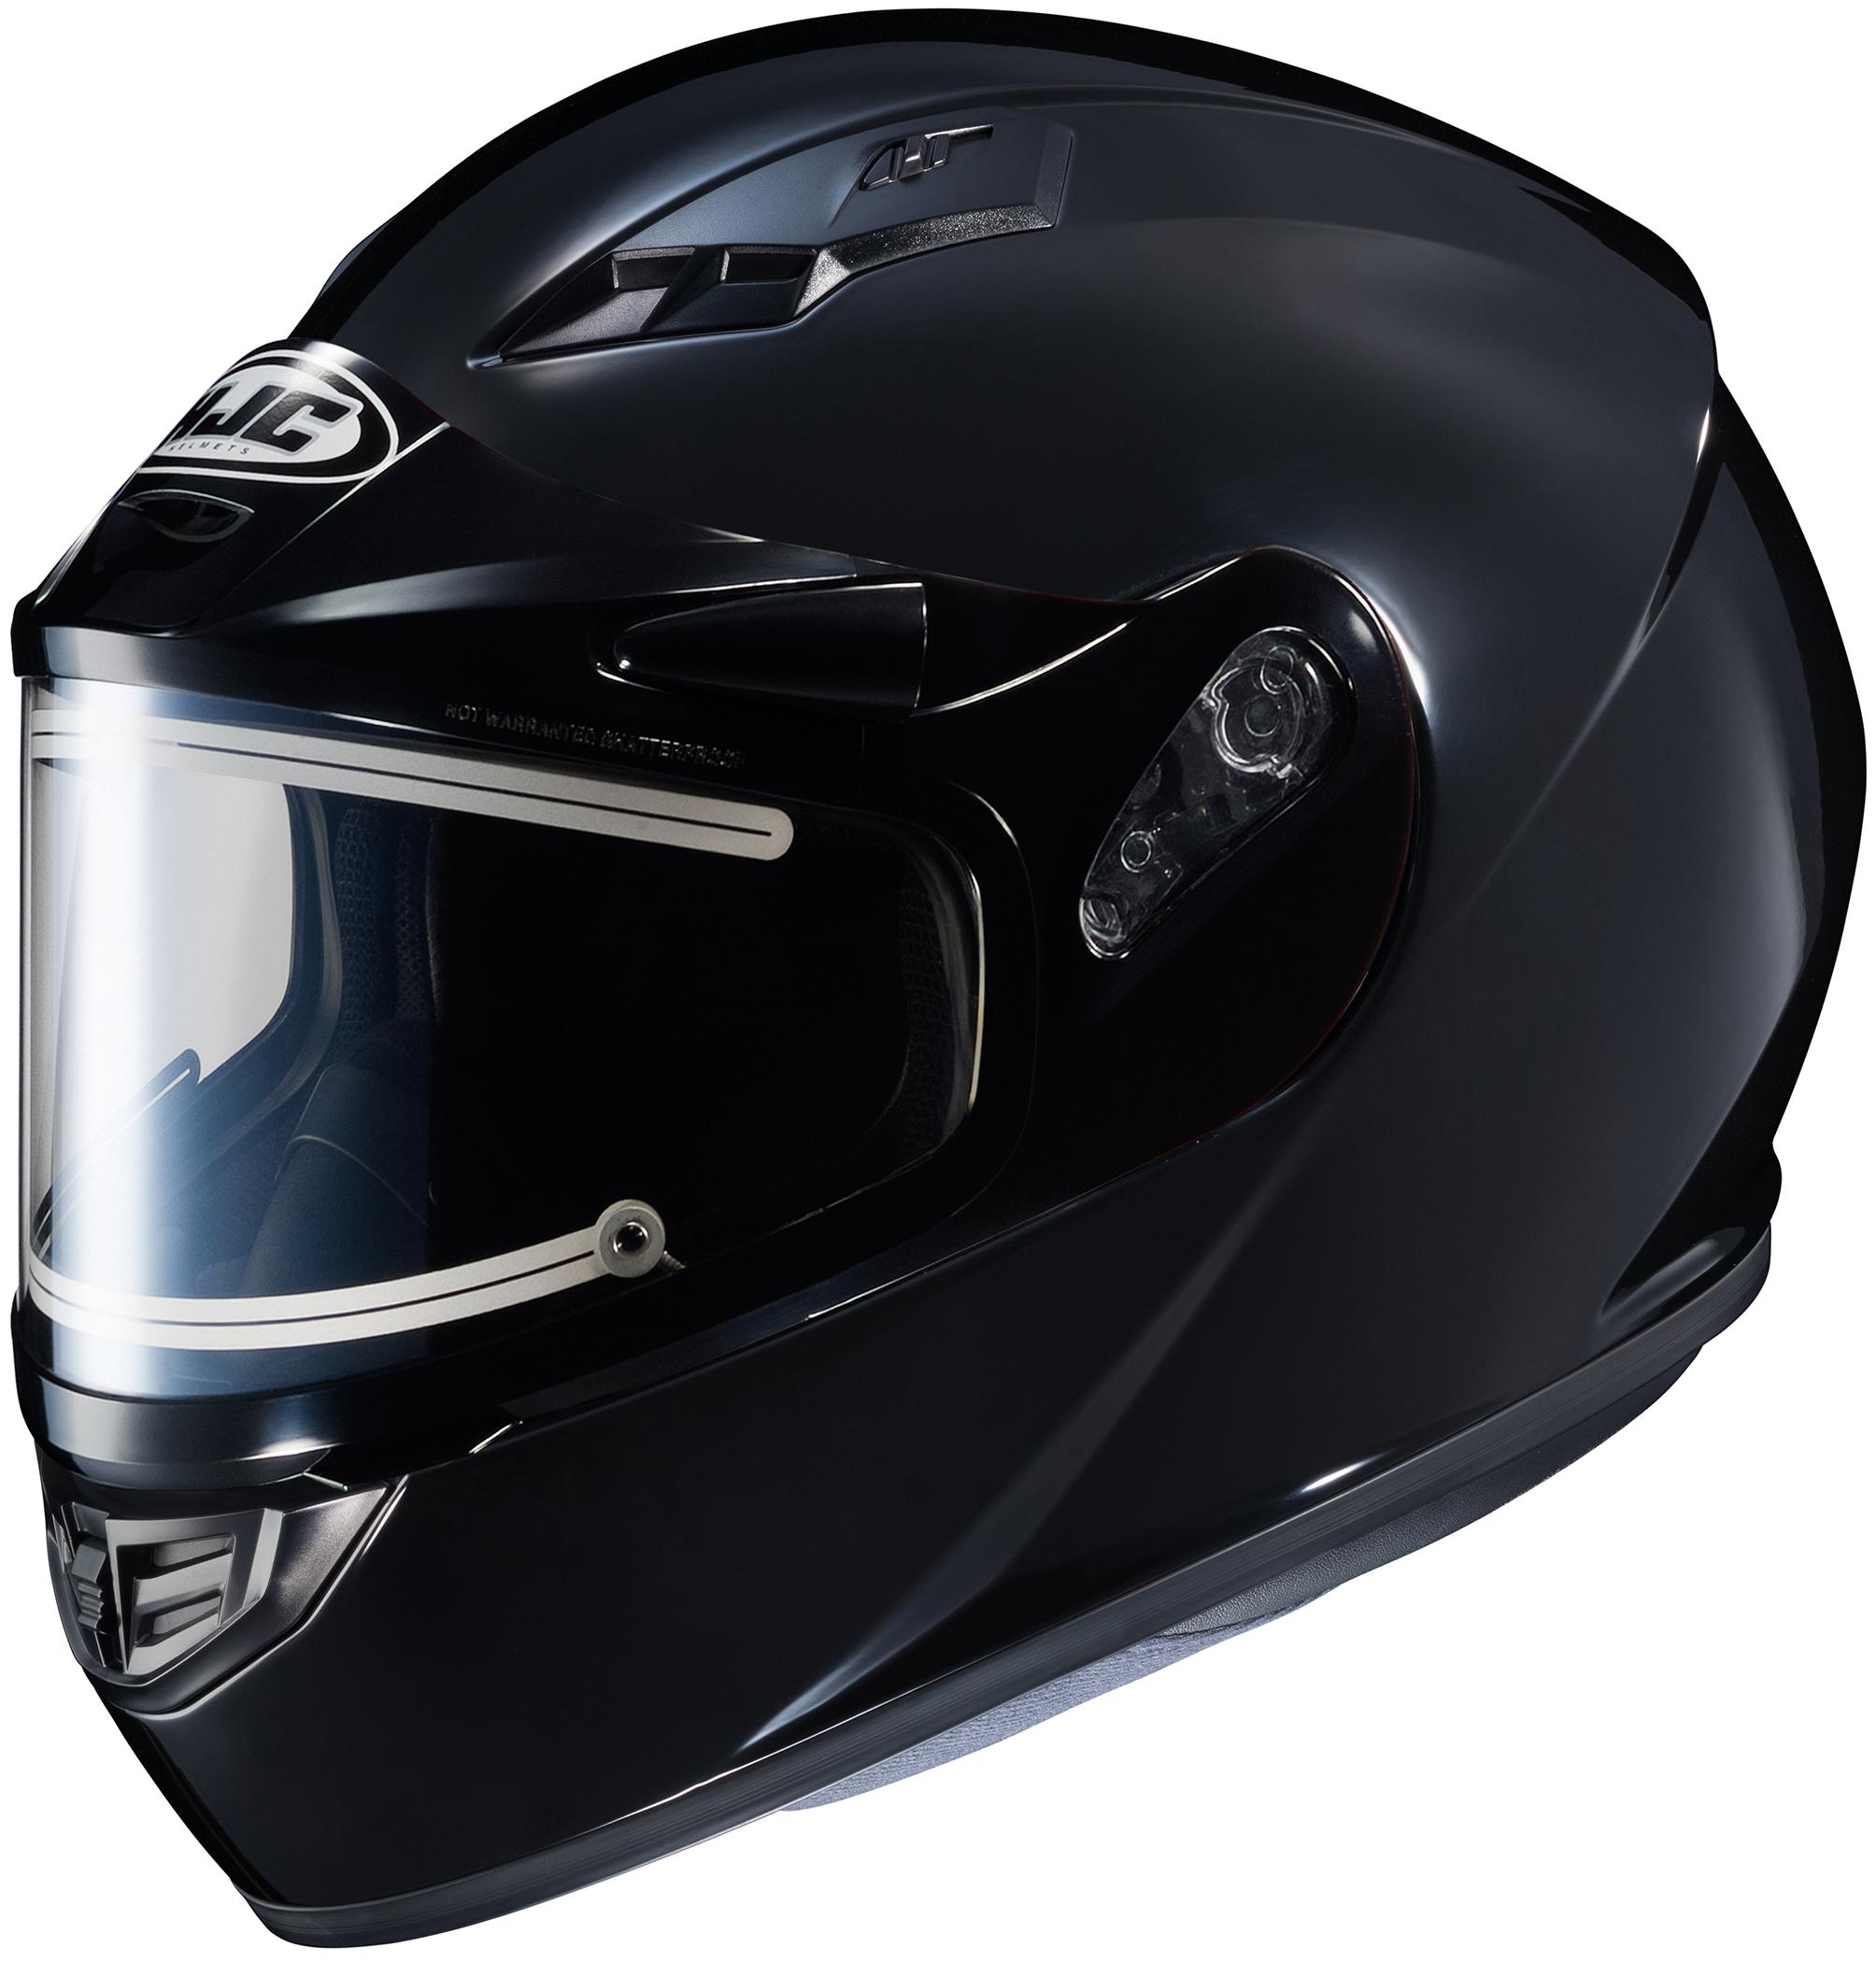 HJC CS-R3 Solid Snow Helmet with Electric Shield